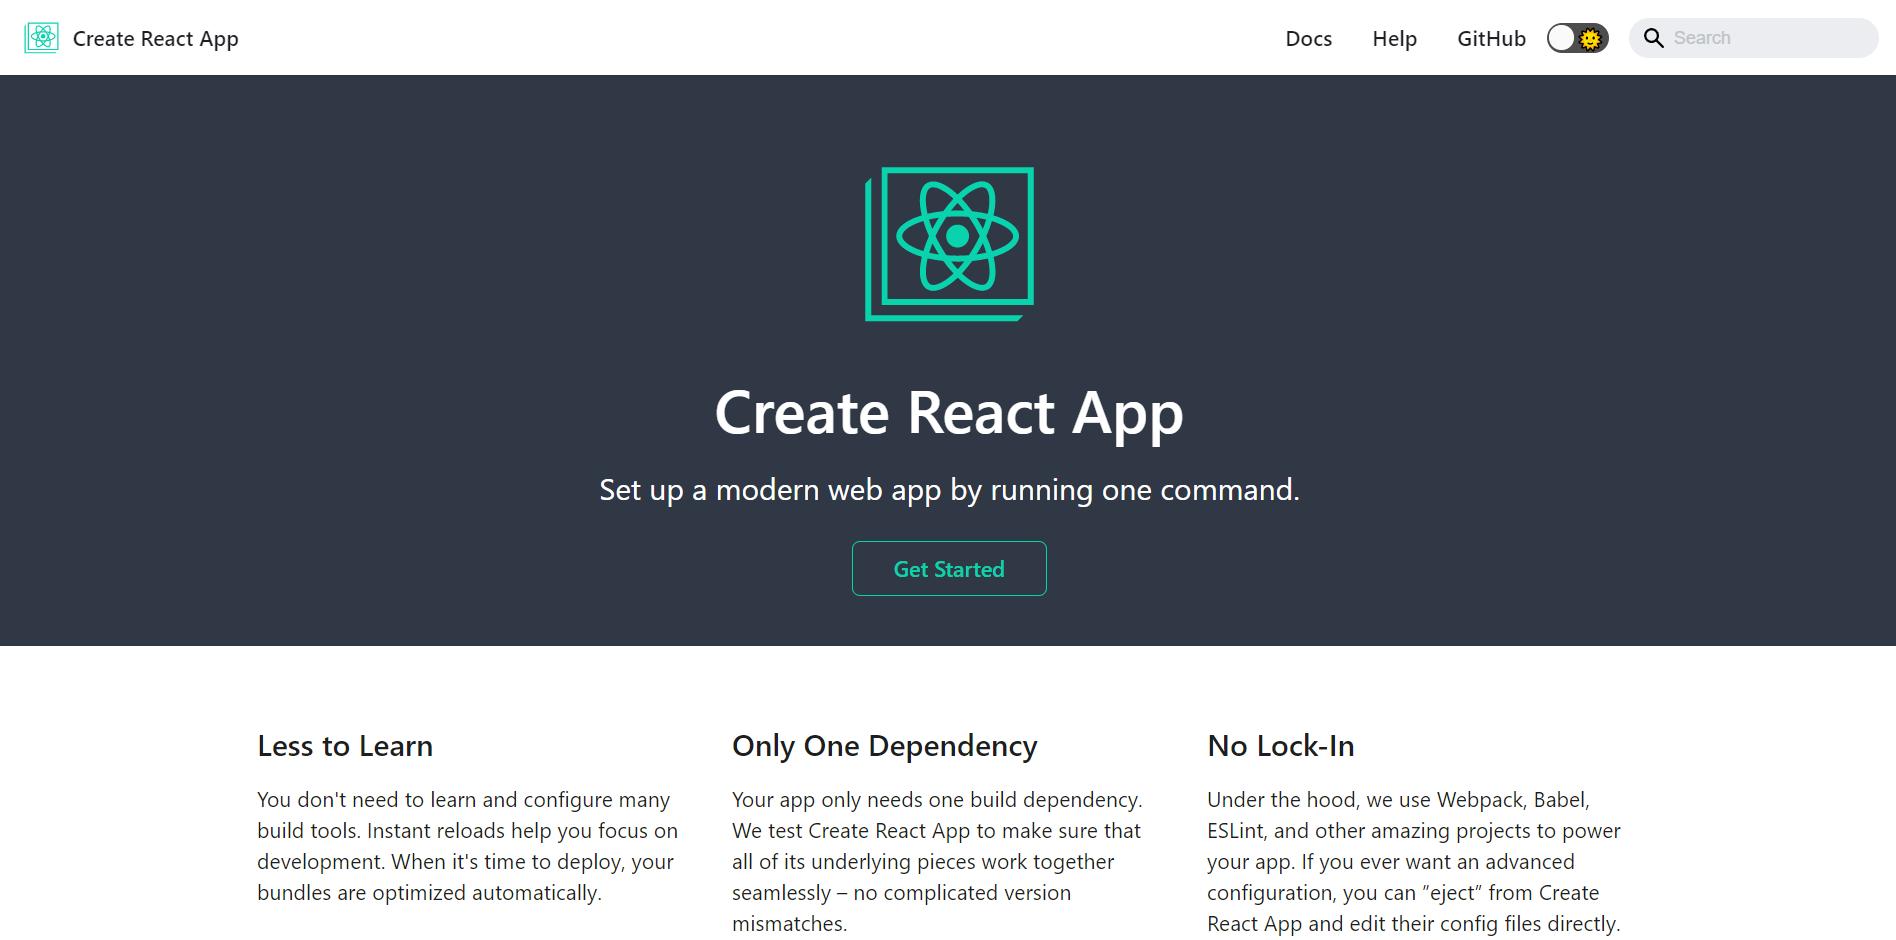 Create React App landing page